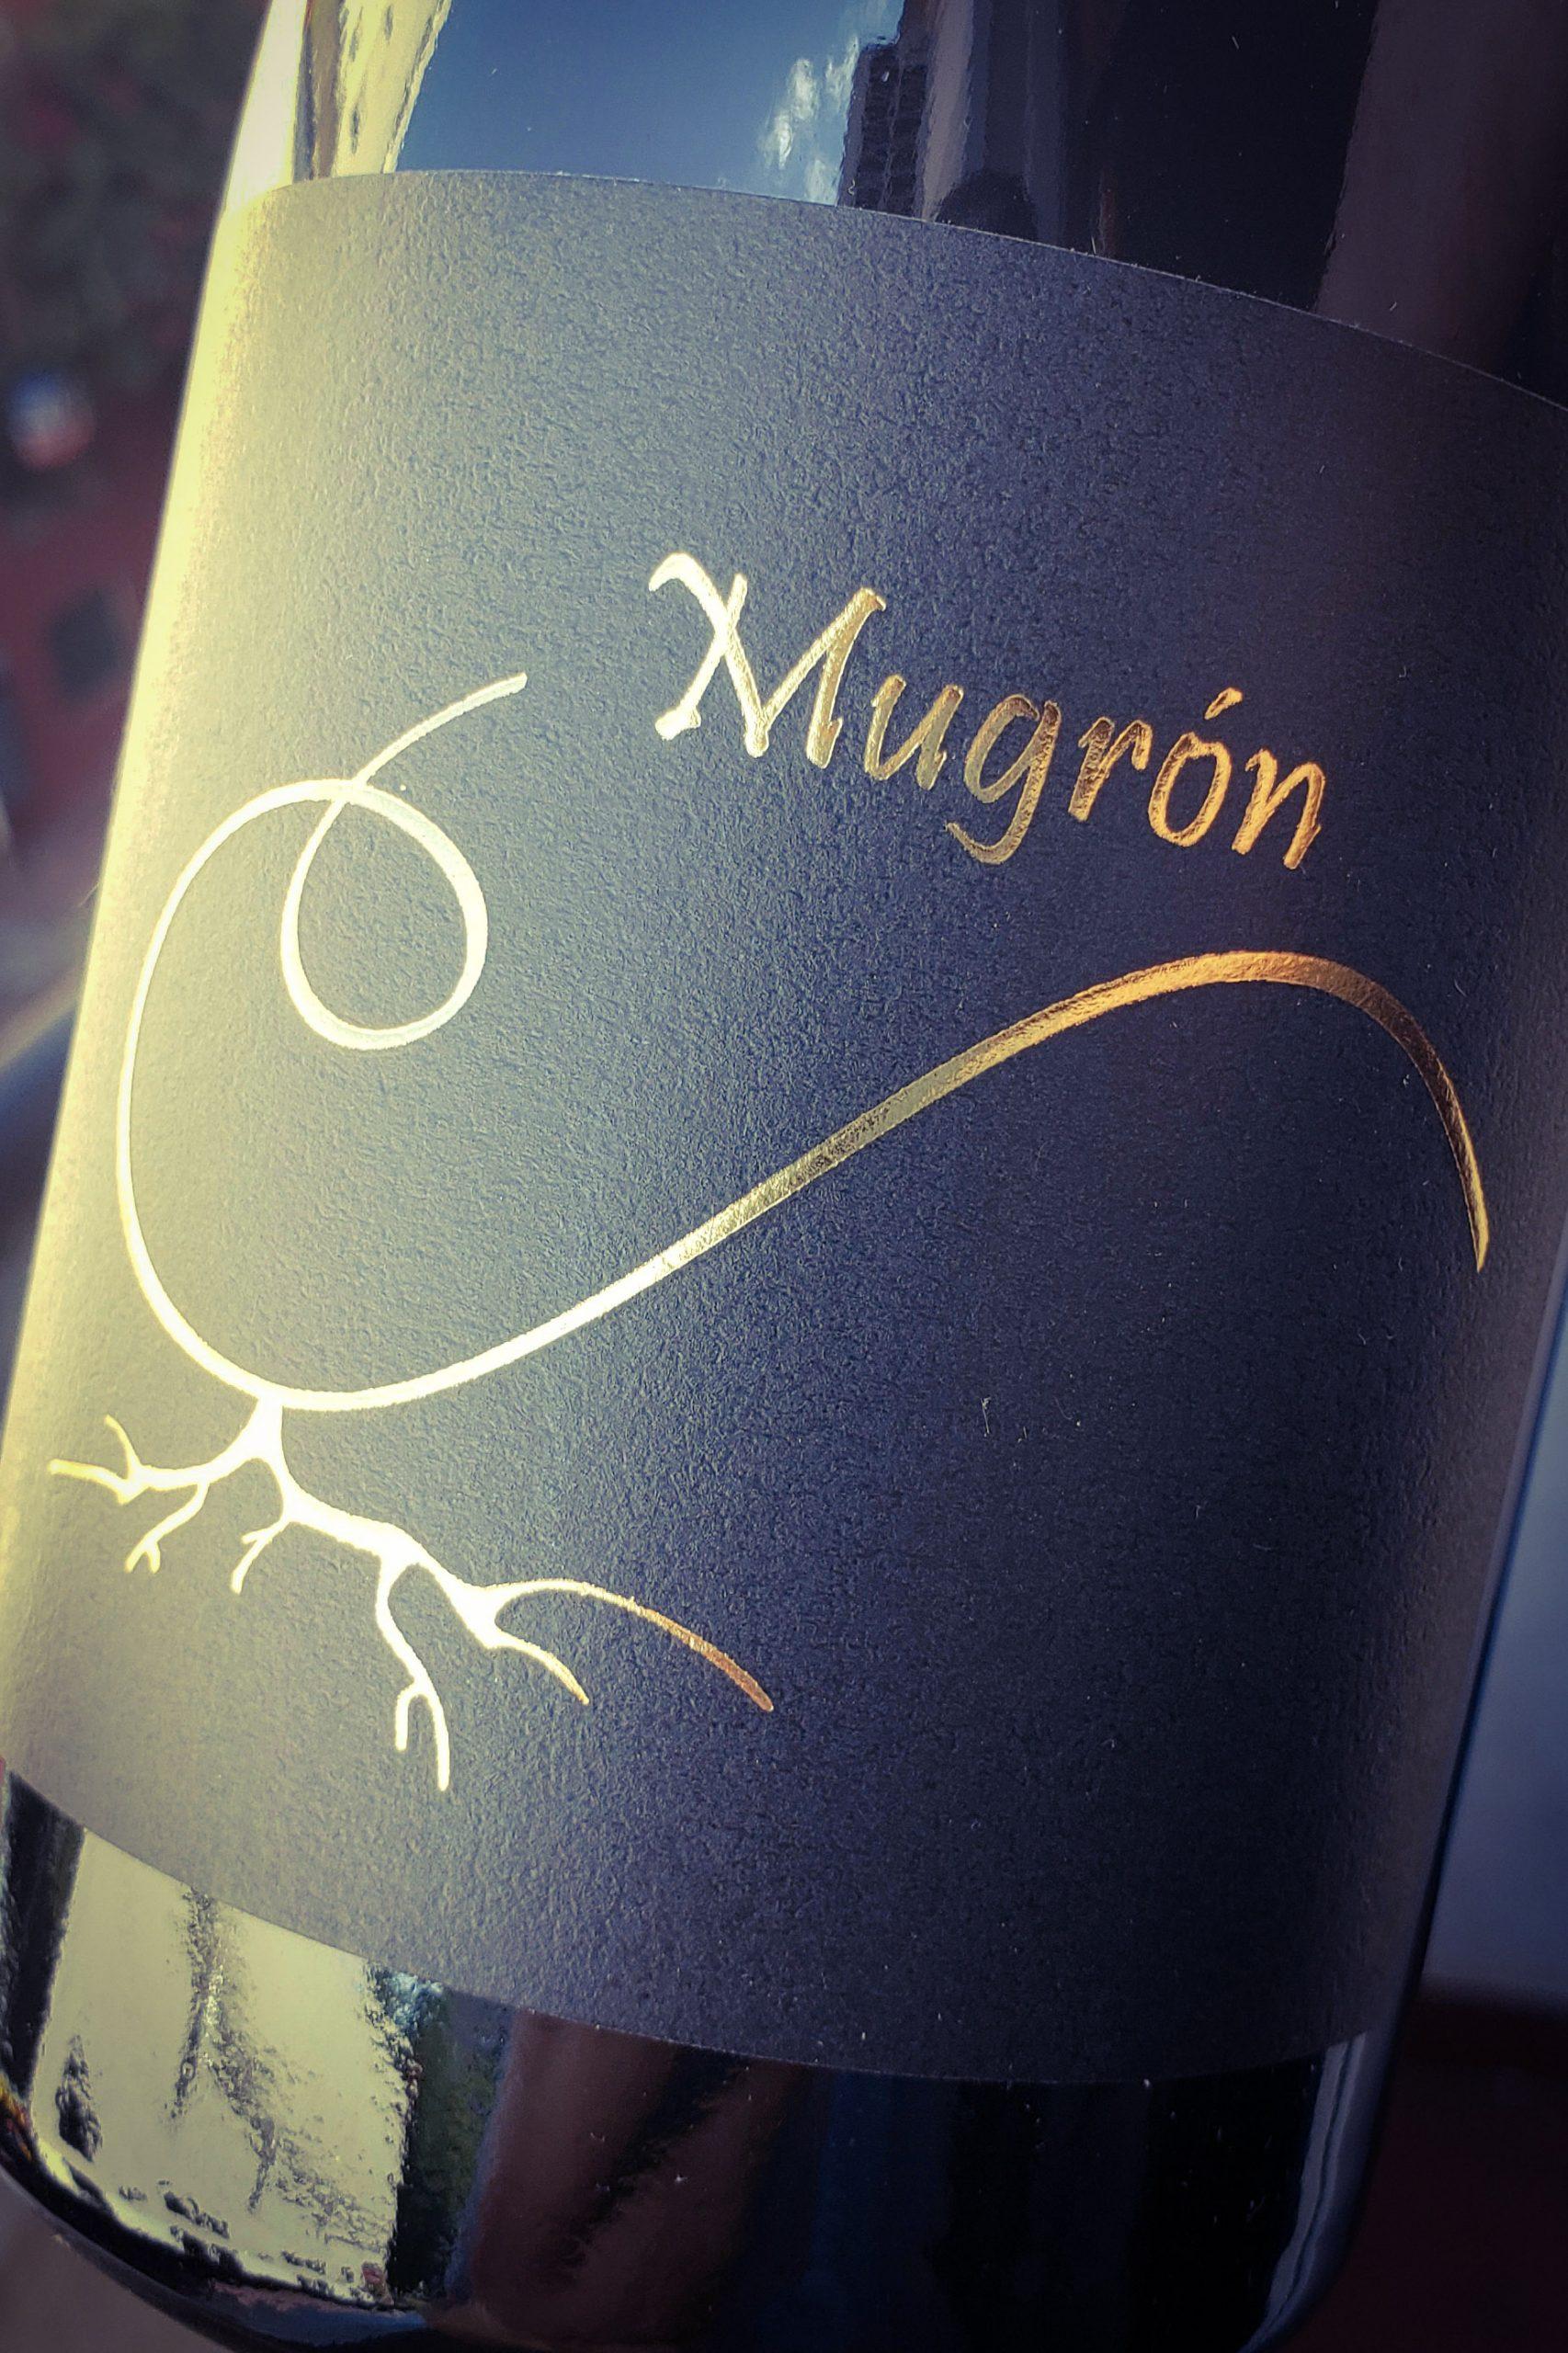 vinos de autor - mugron black